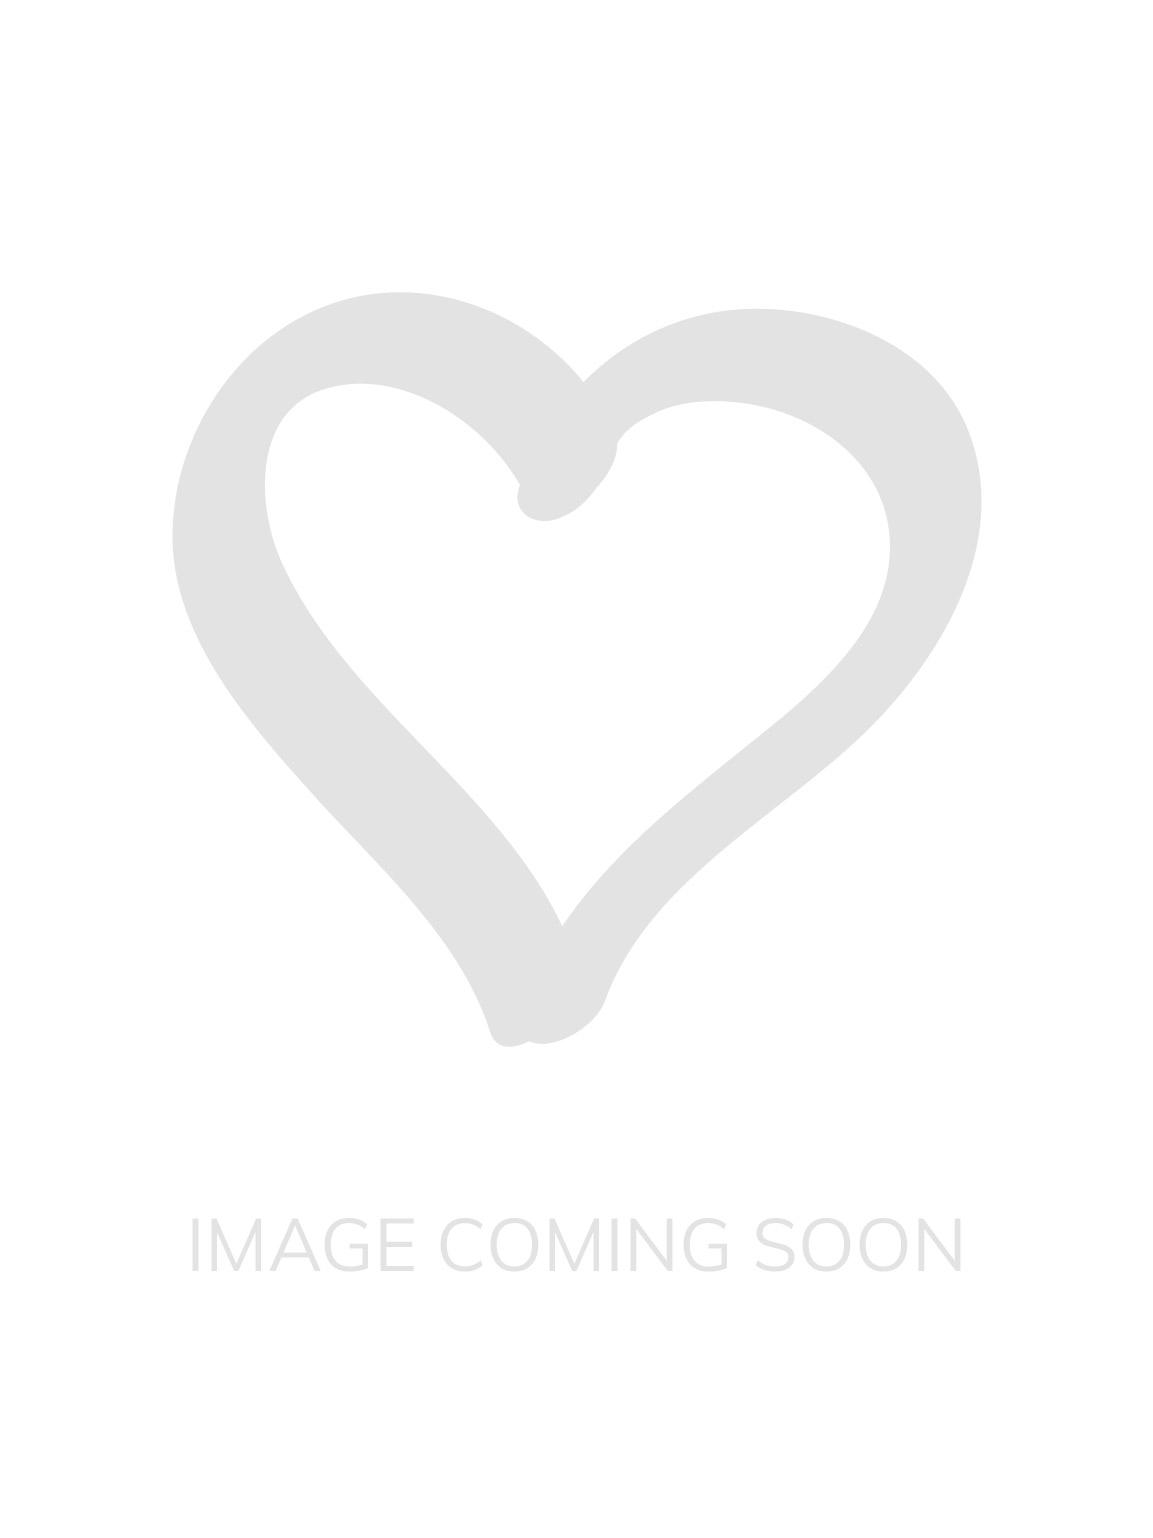 f4983b29060 La Femme Bikini Brief - Naturally Nude